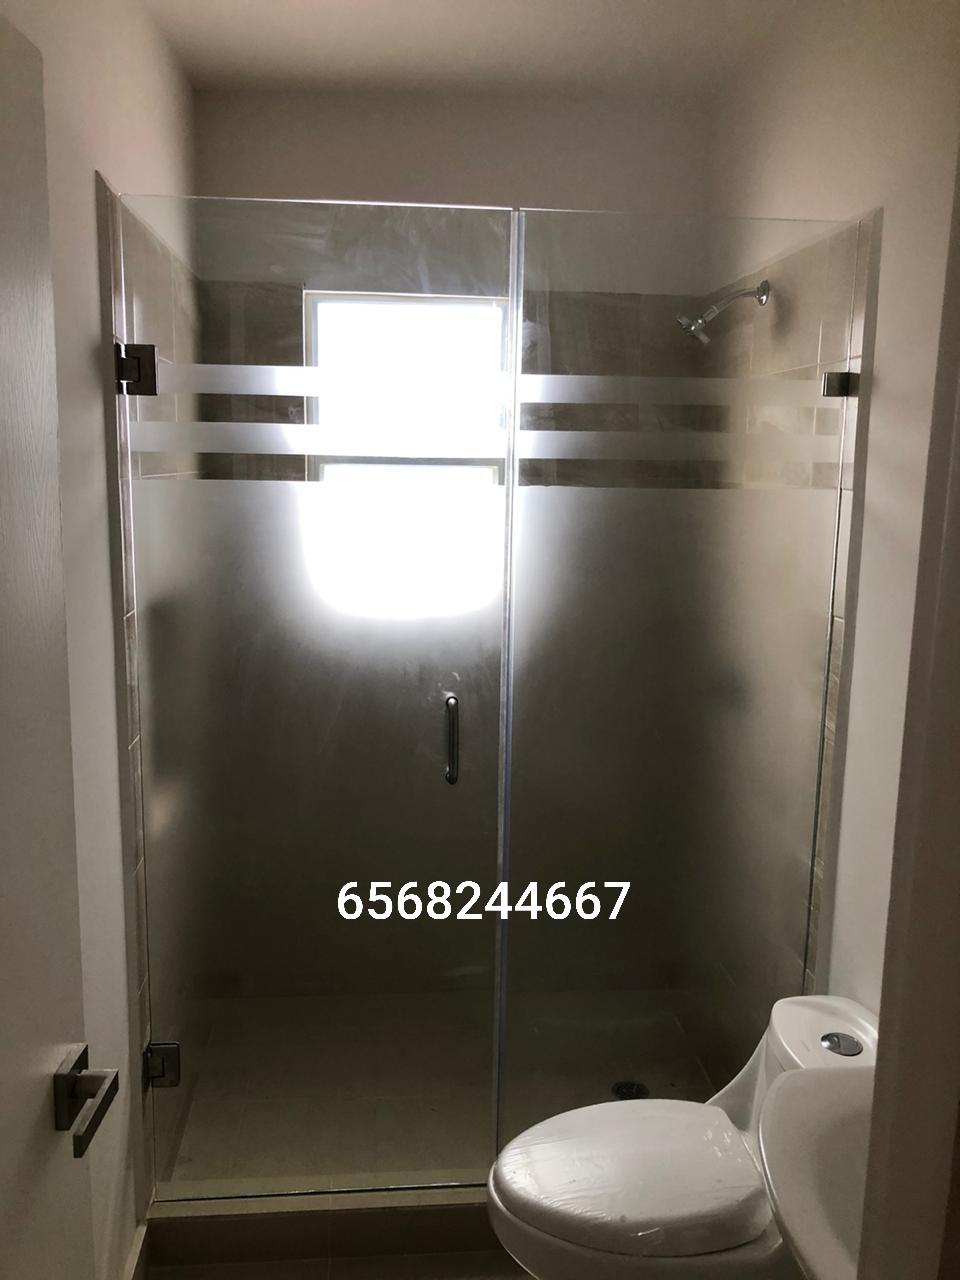 20200421_153433